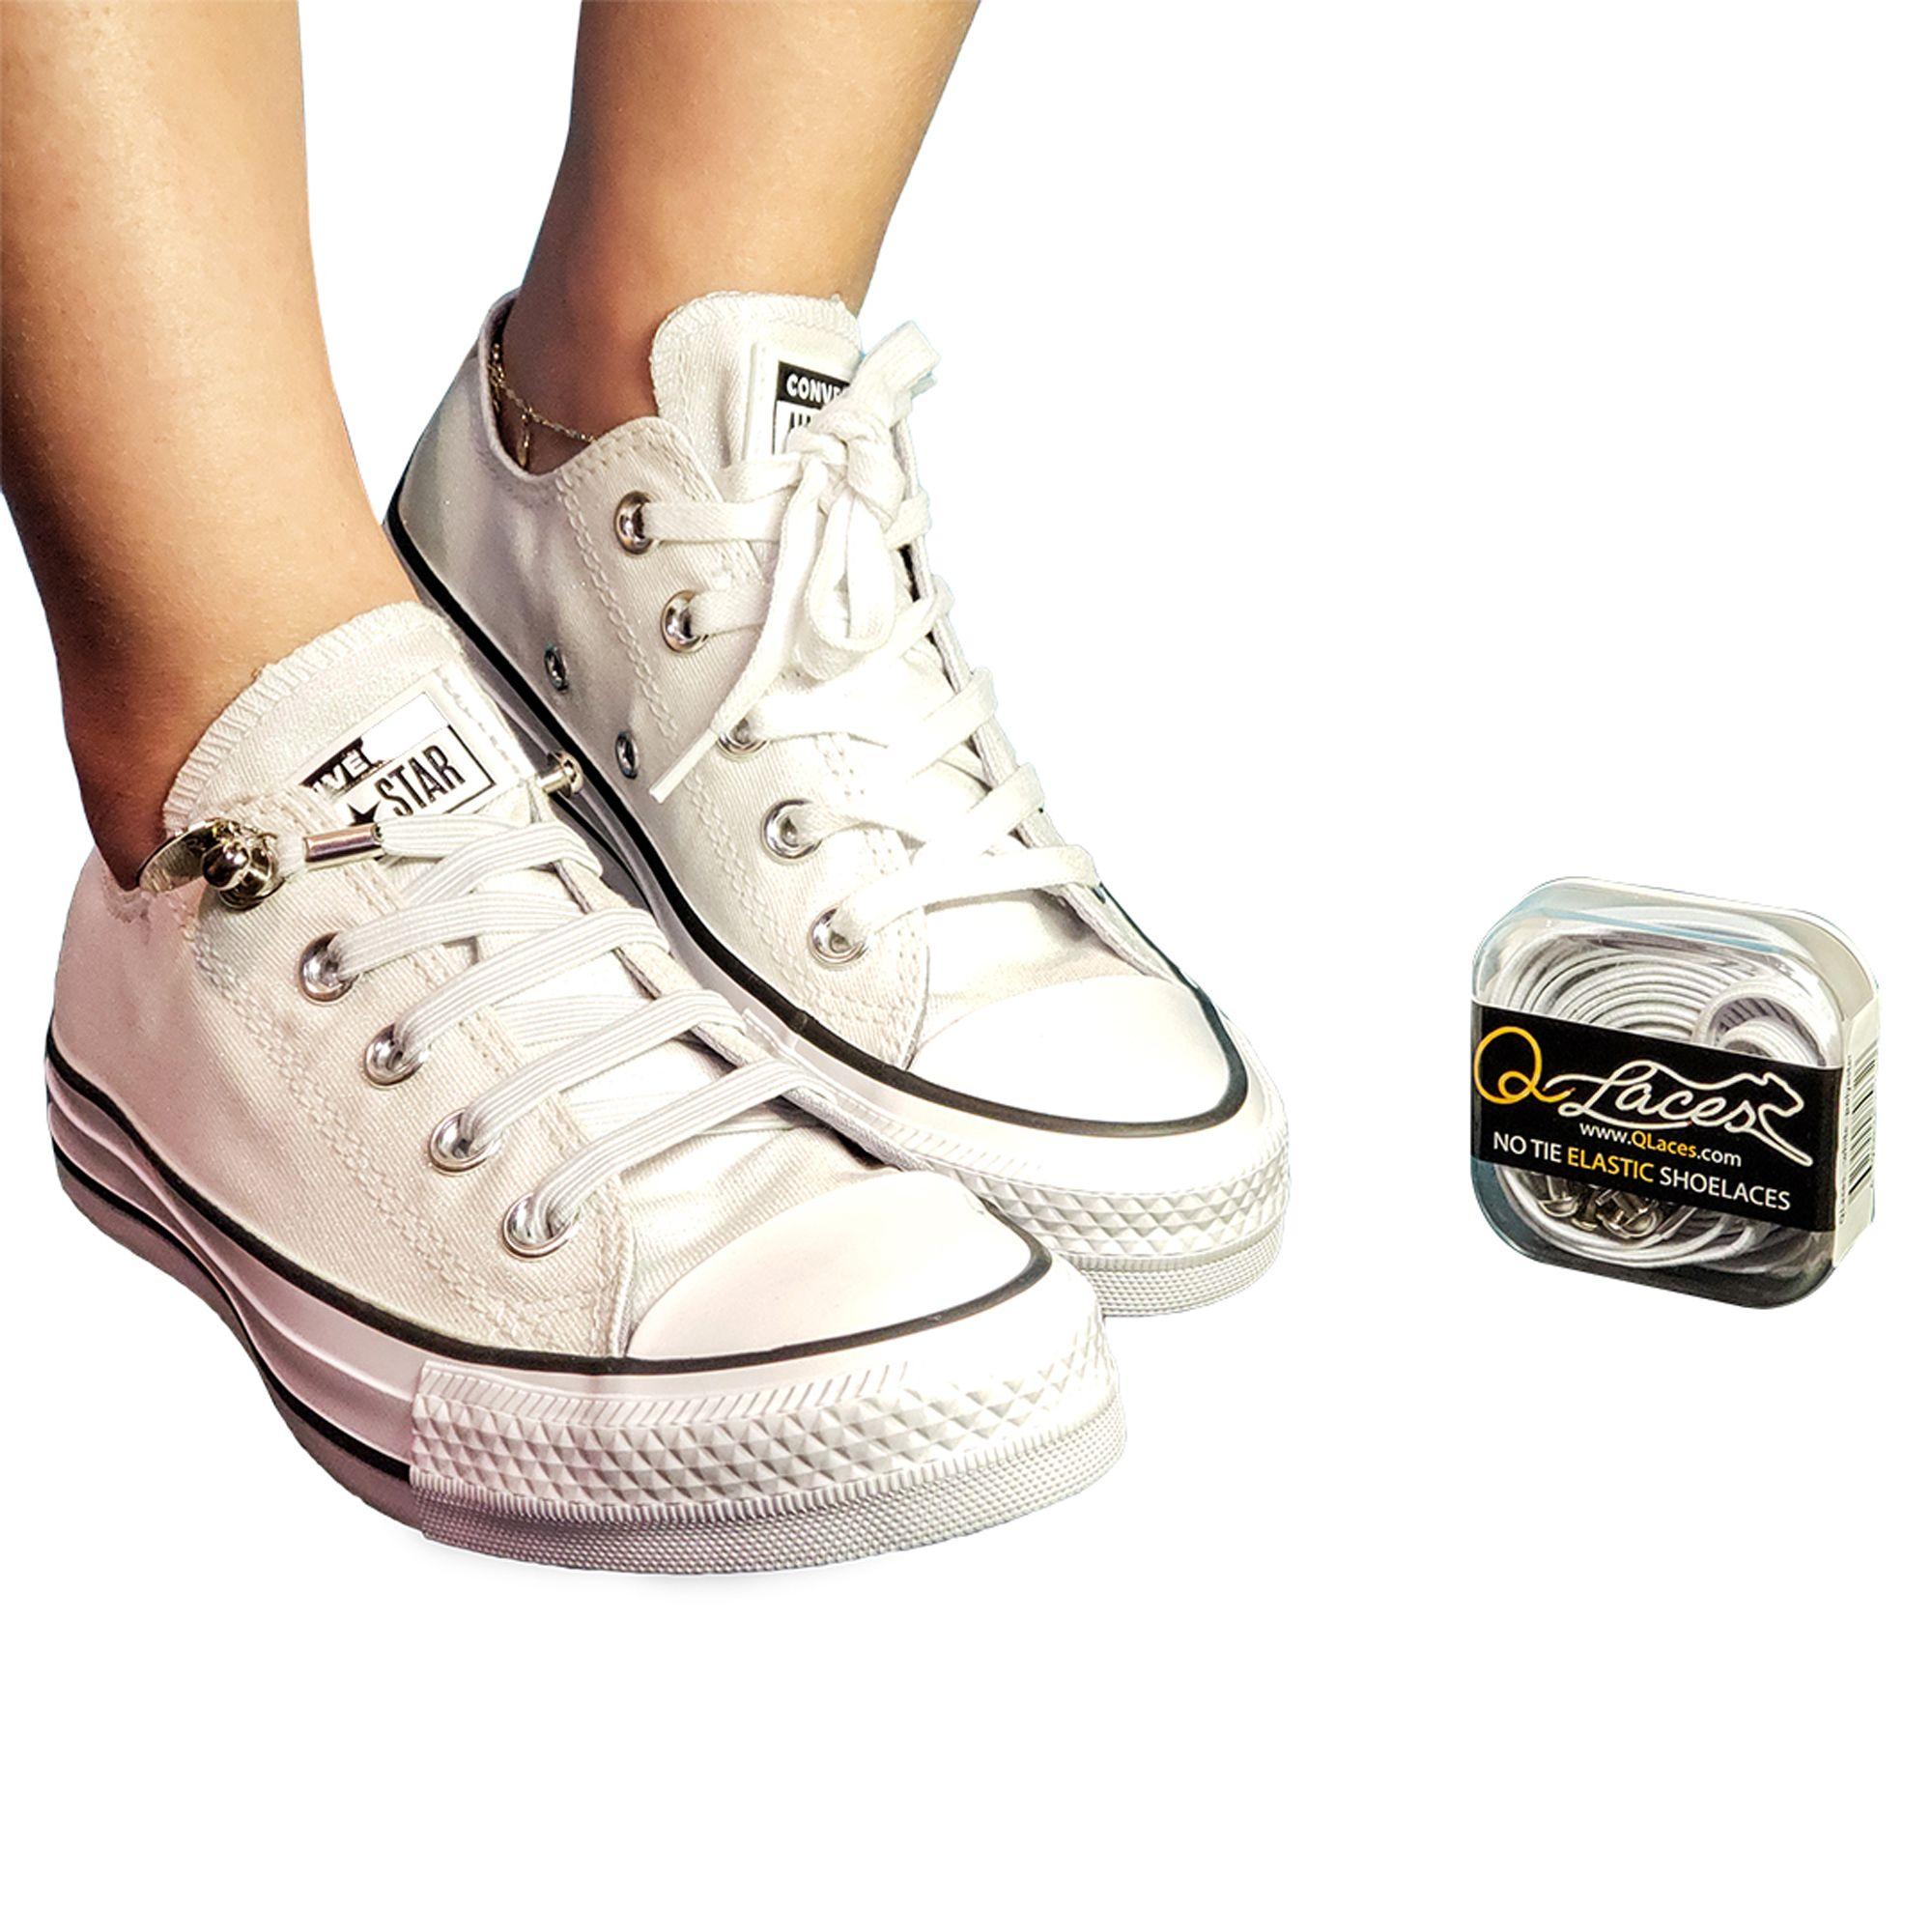 Tie shoelaces, Converse high top sneaker